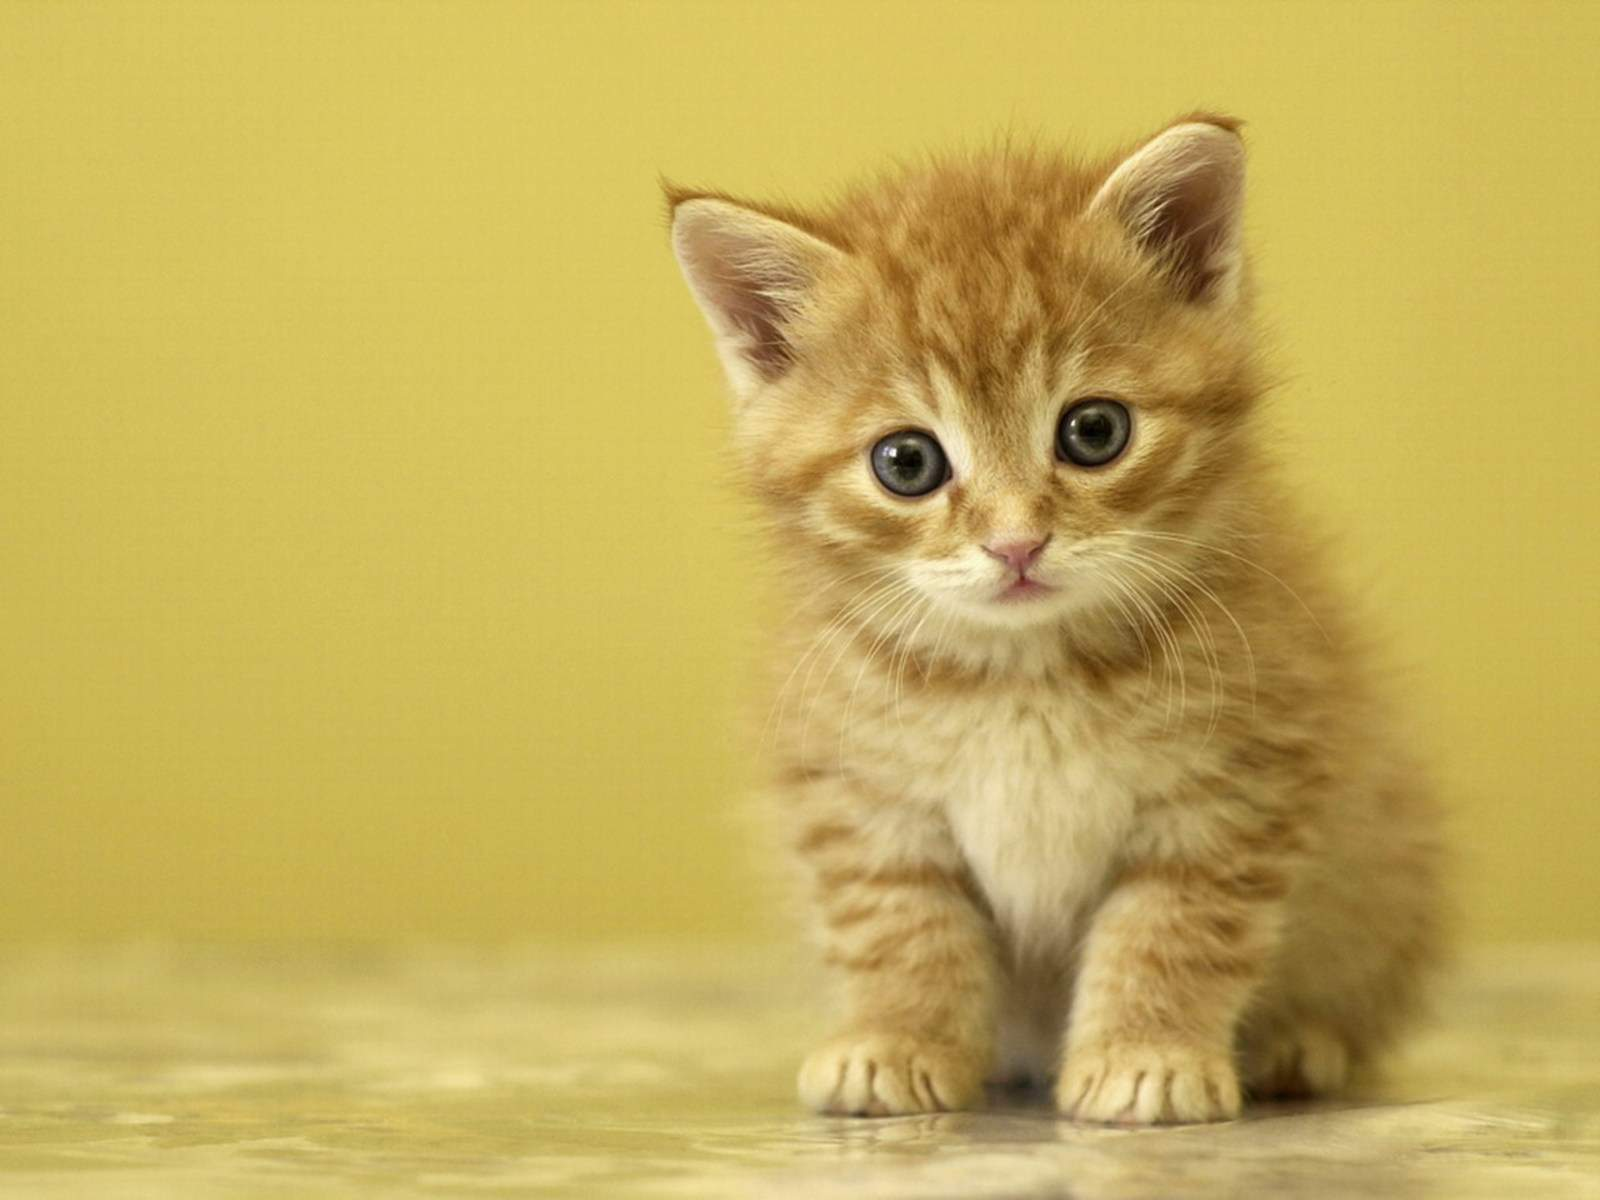 Background Kucing Comel Kucingcomel Com